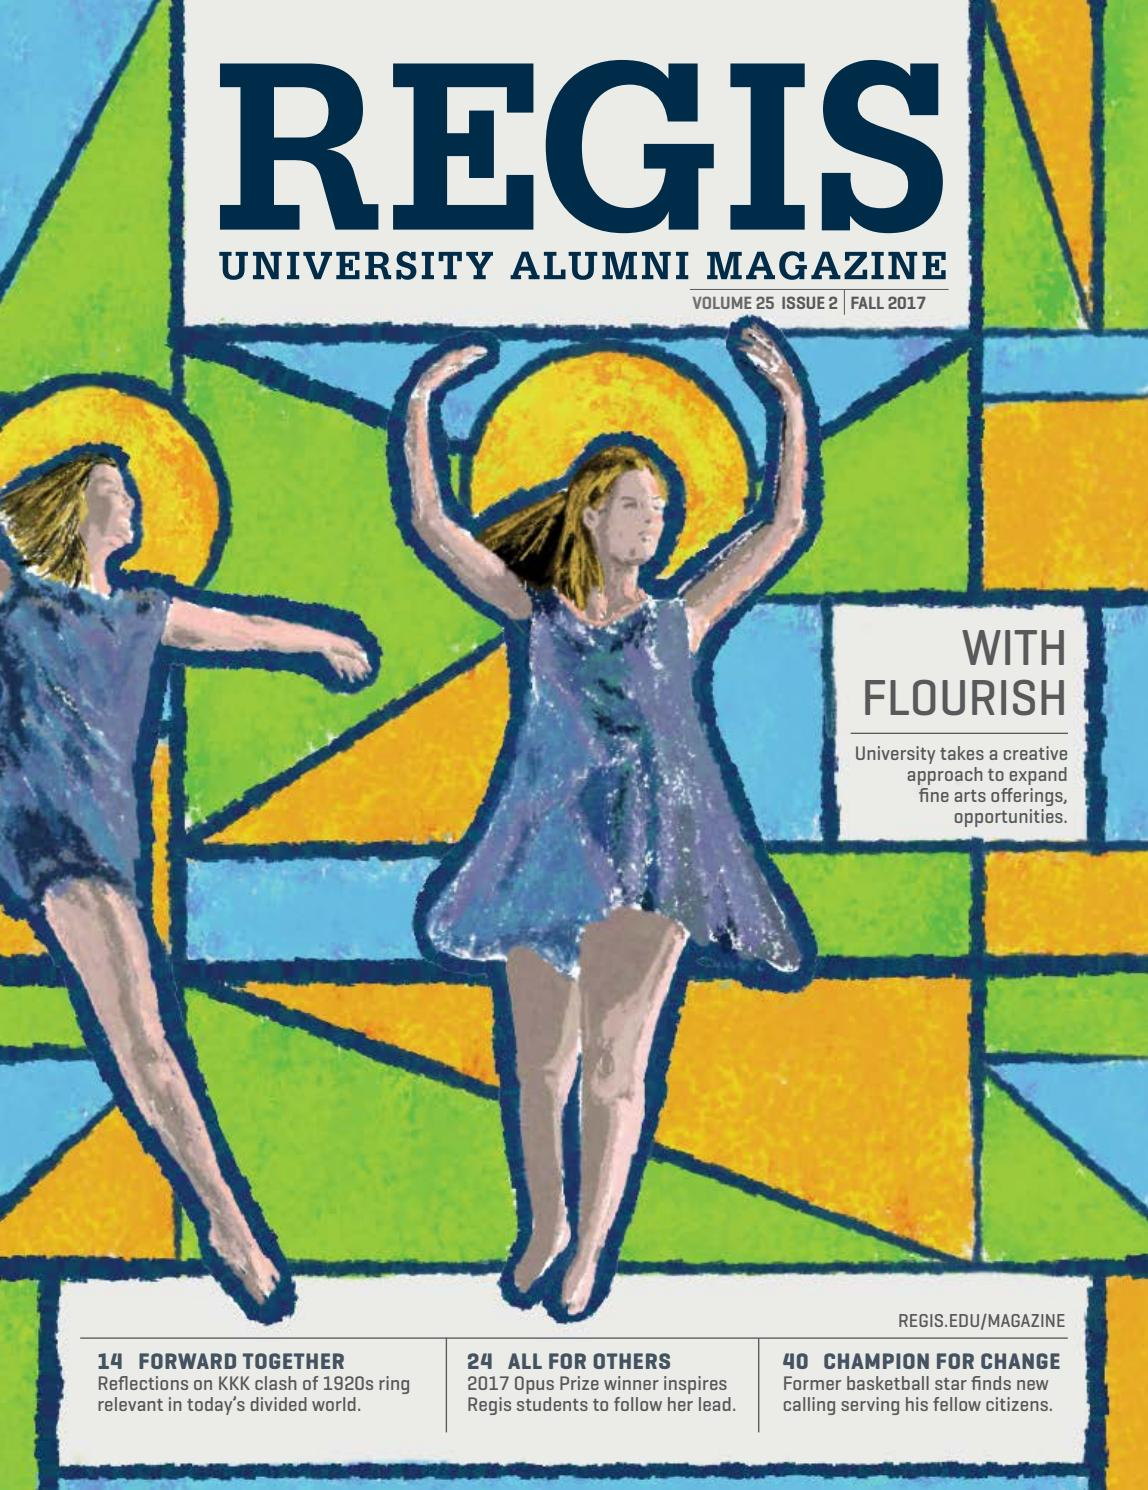 Regis alumni magazine fall 2017 by Marcom - issuu